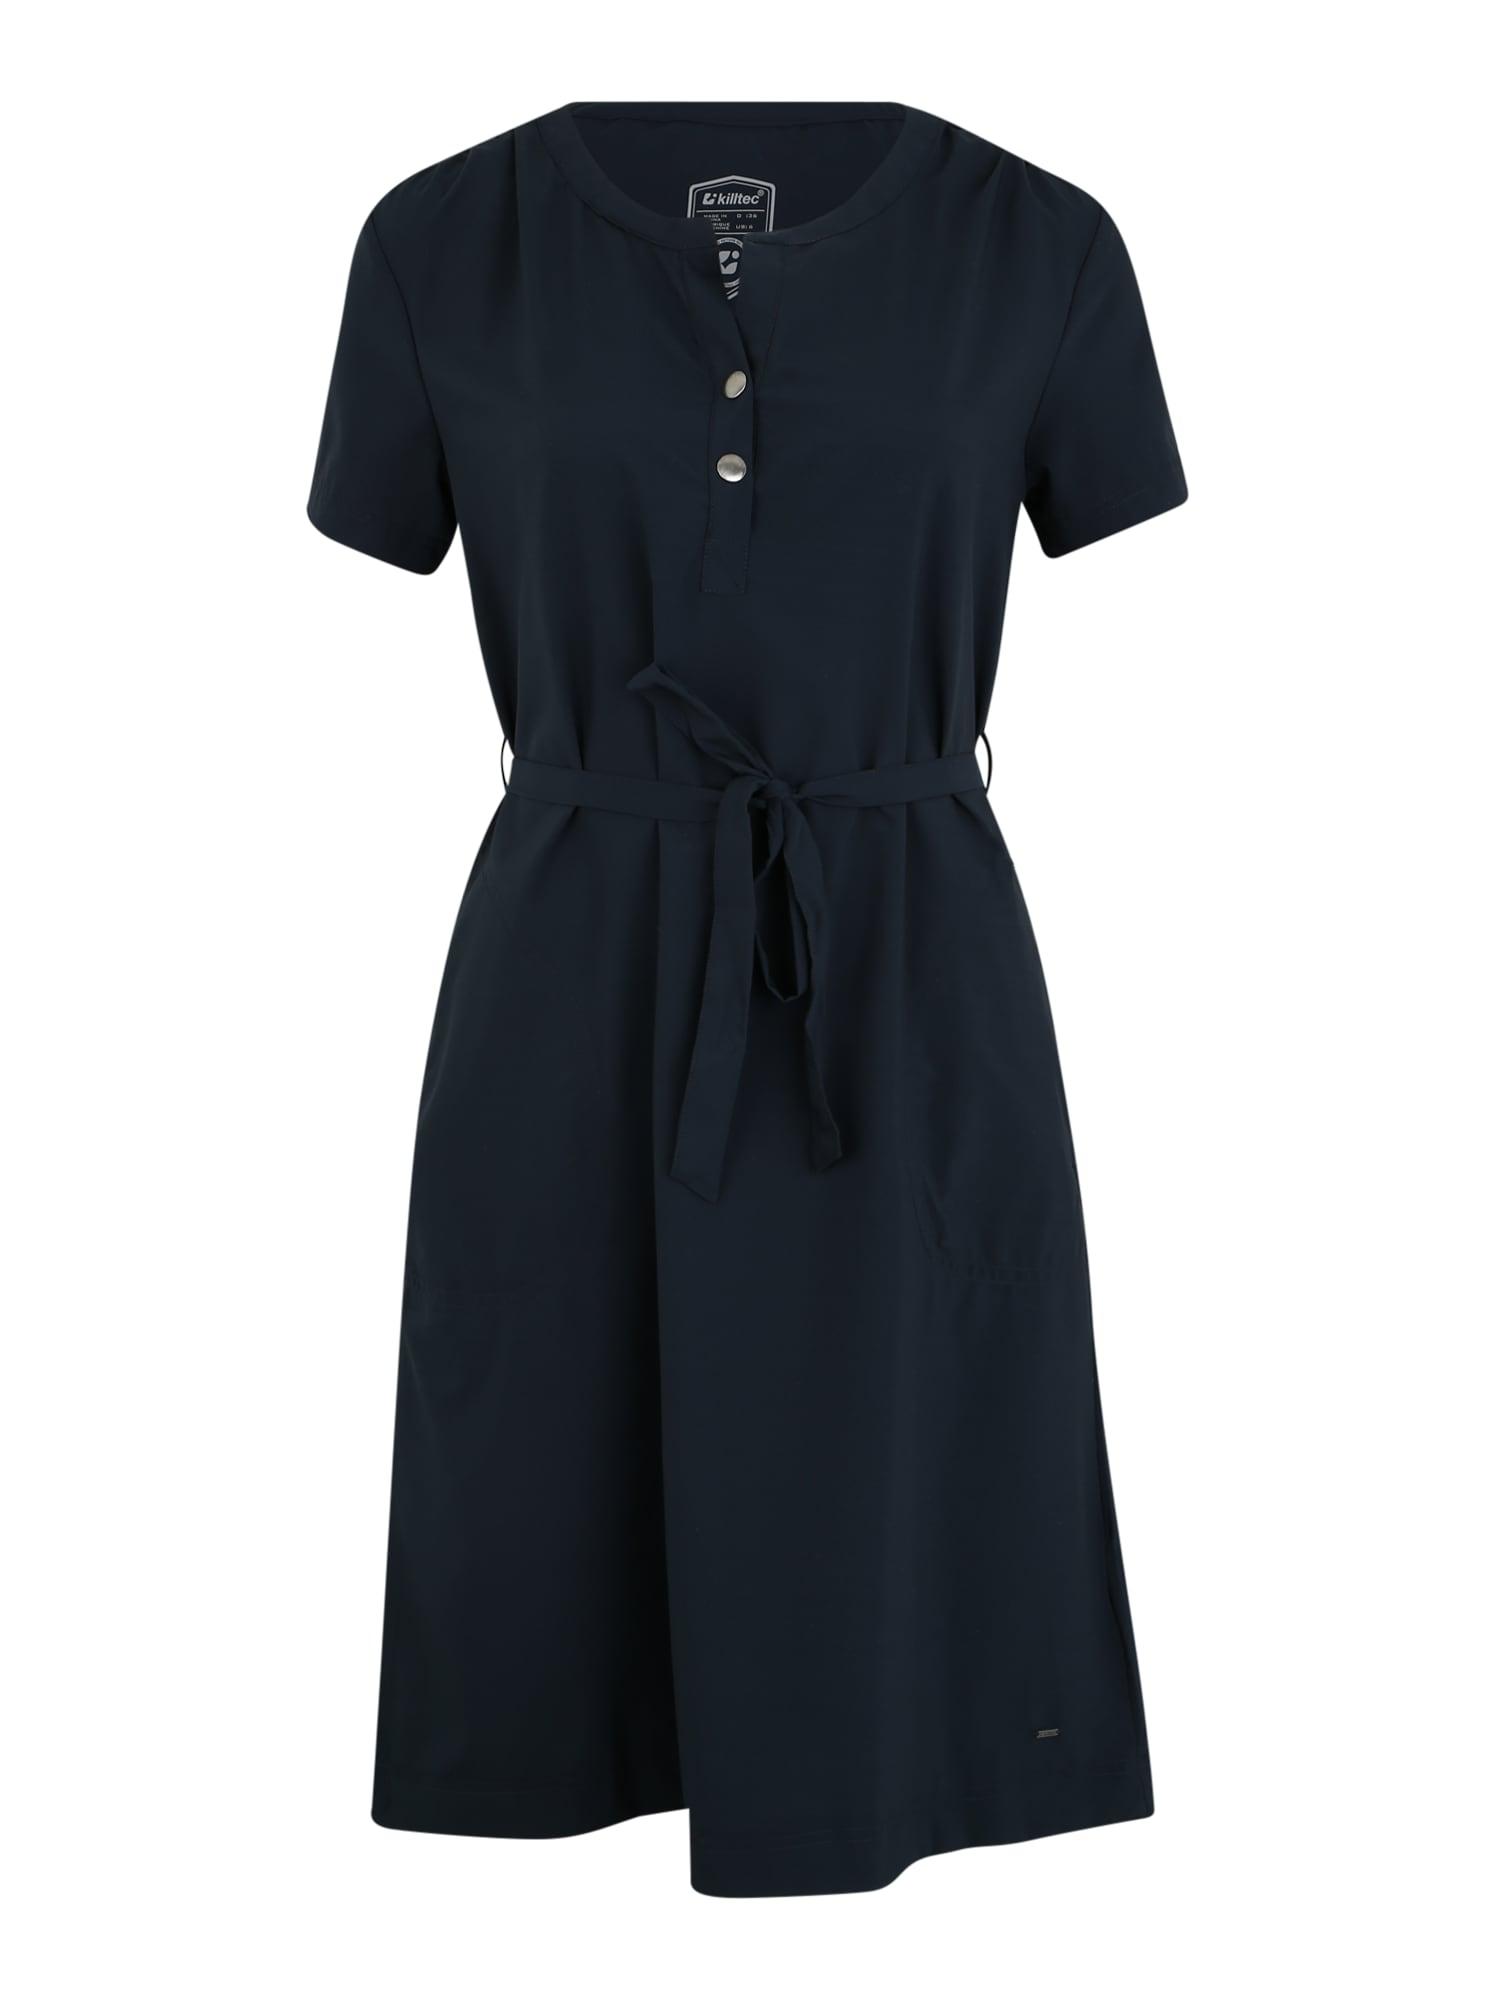 KILLTEC Sportinė suknelė 'Ebba' tamsiai mėlyna